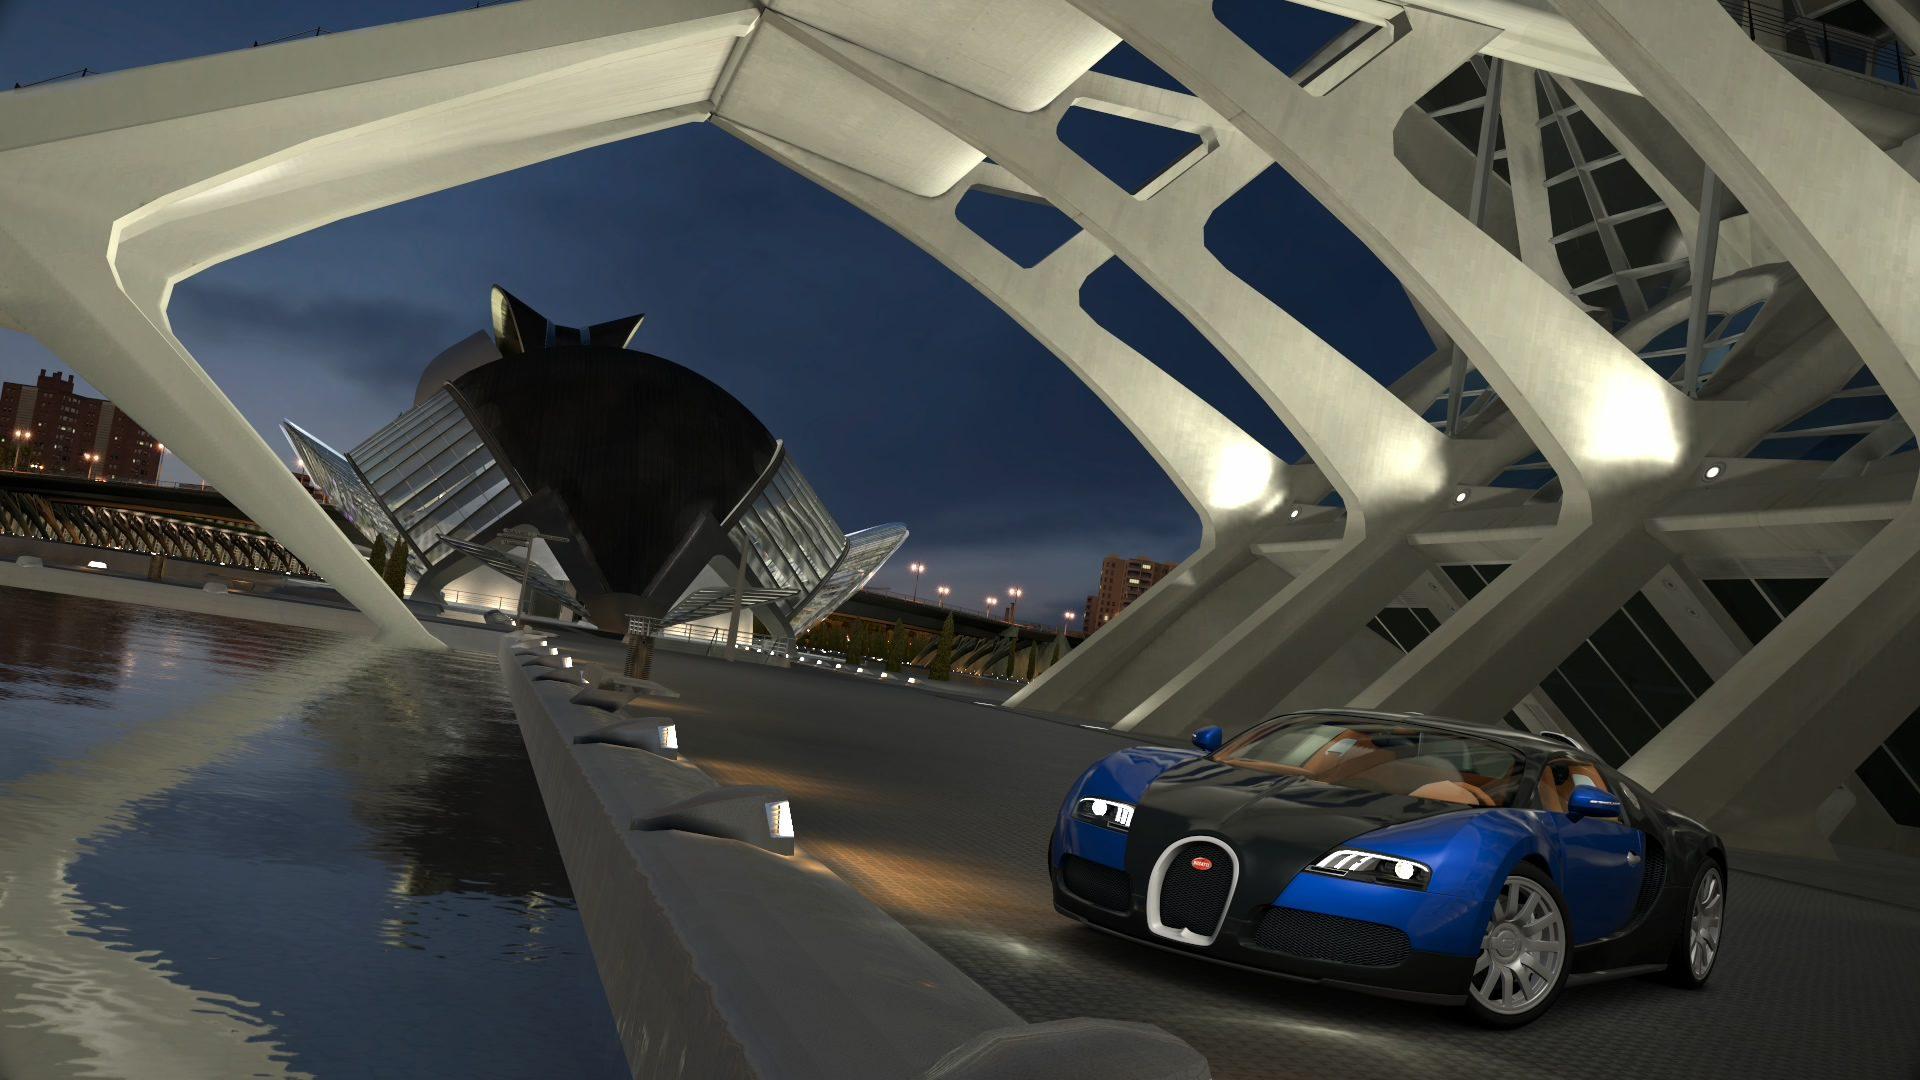 City of Arts and Sciences - Night_1.jpg